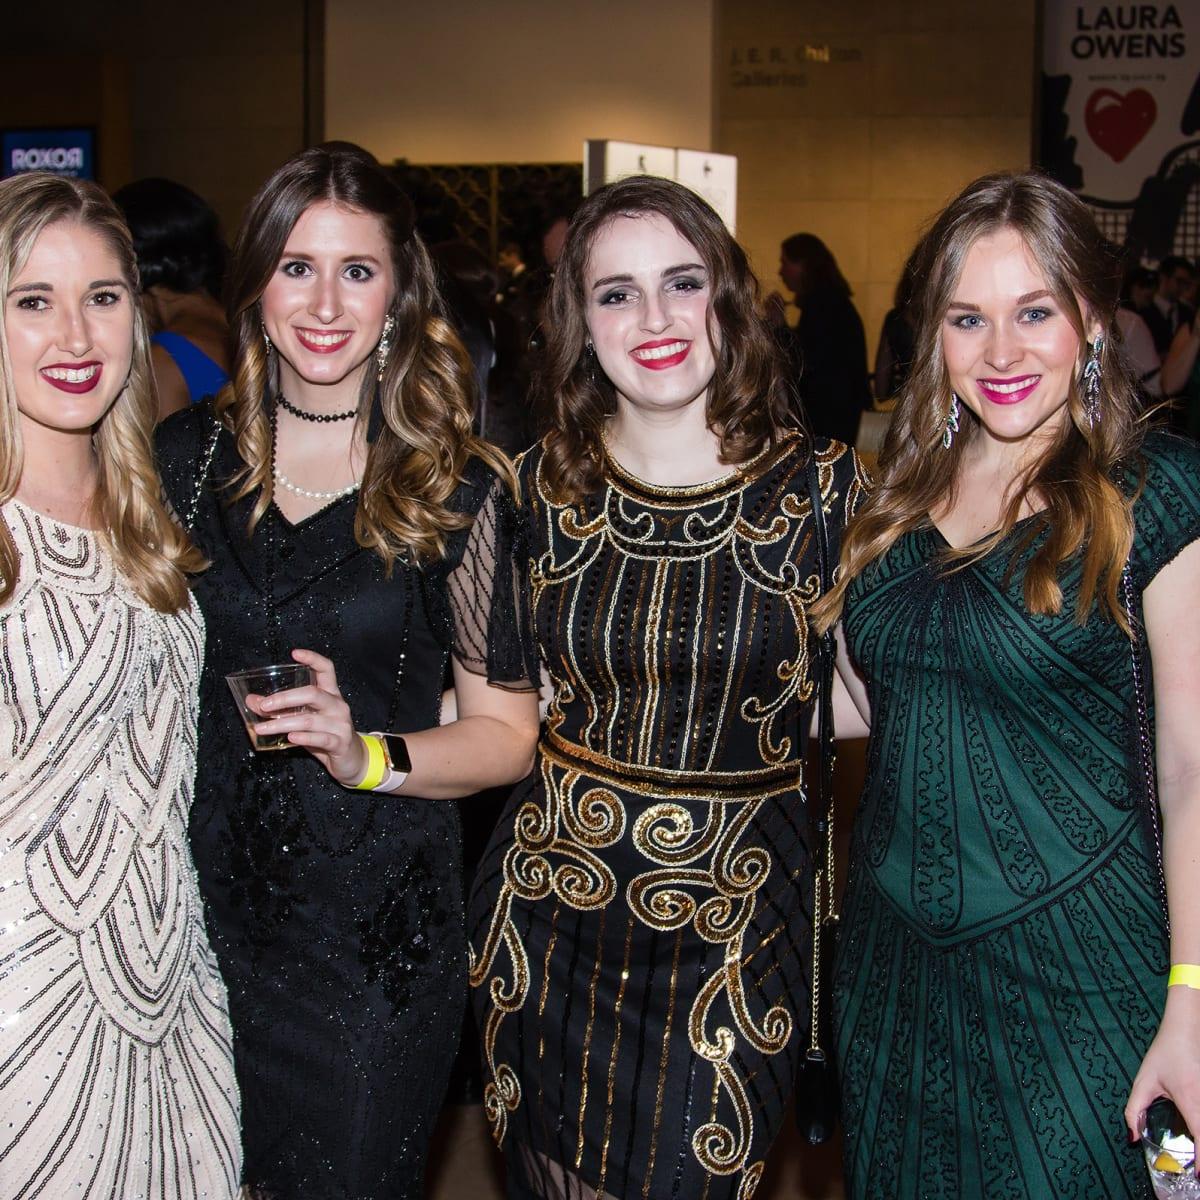 Kali Christensen, Anna Sorenson, Elaine Scarborough, Shannon Carl